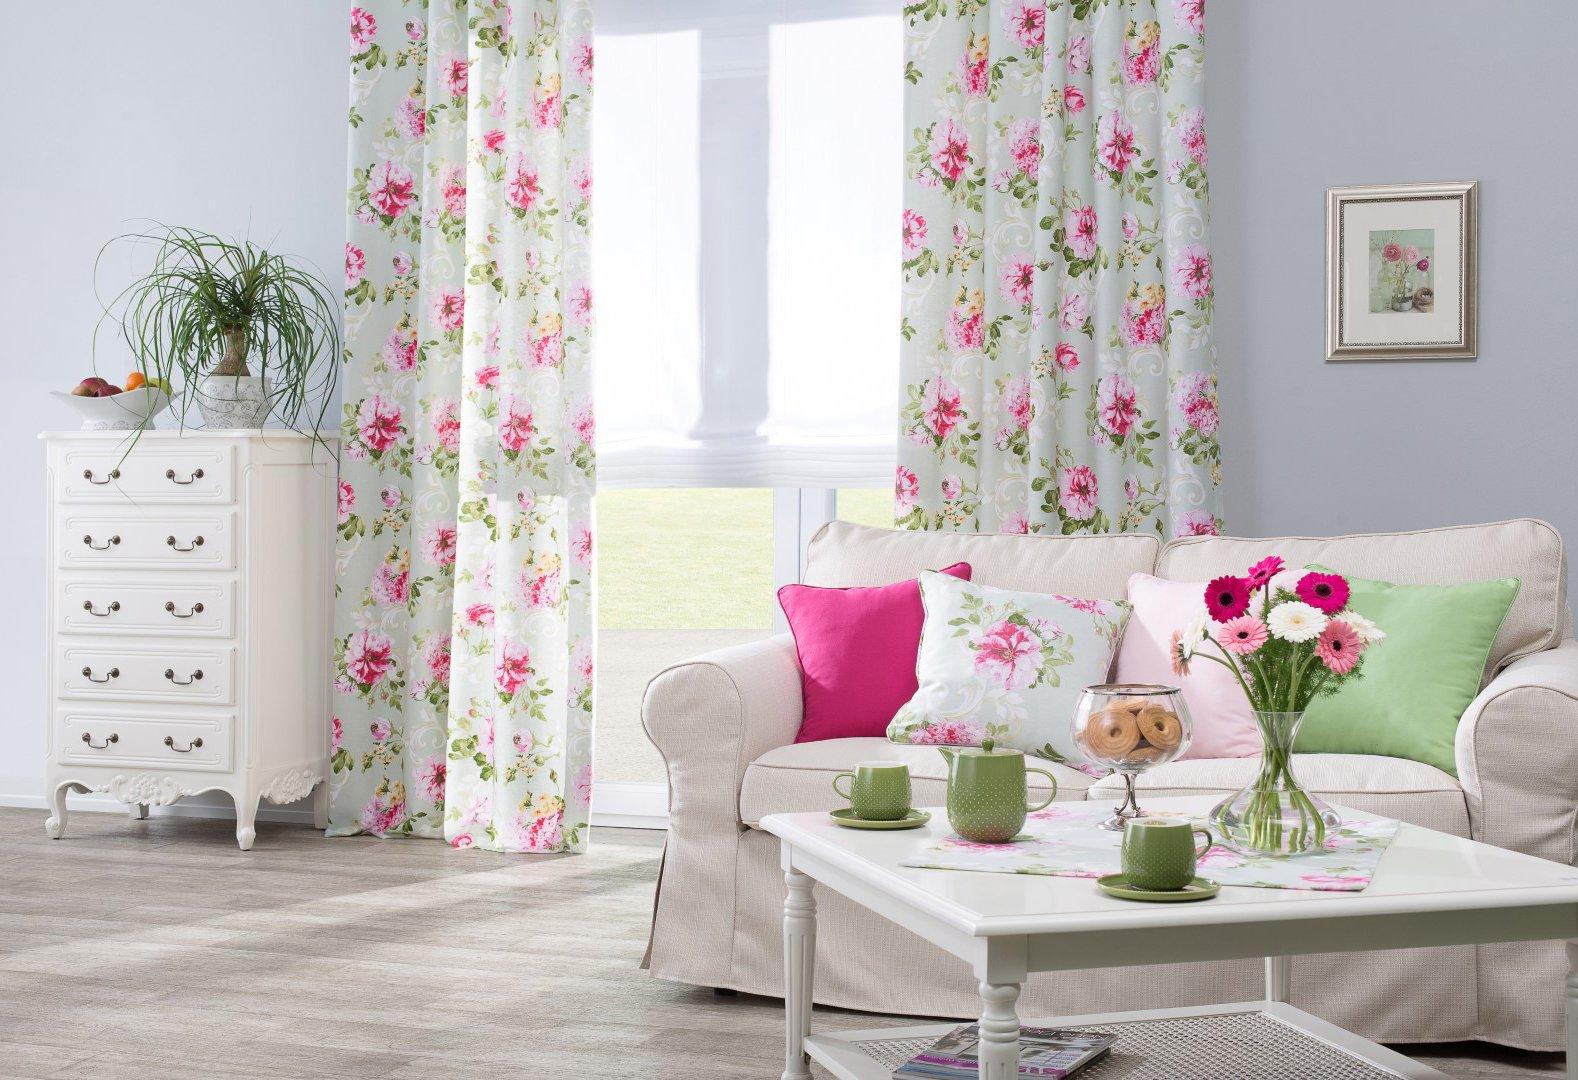 Obývačka s romantickým nádychom